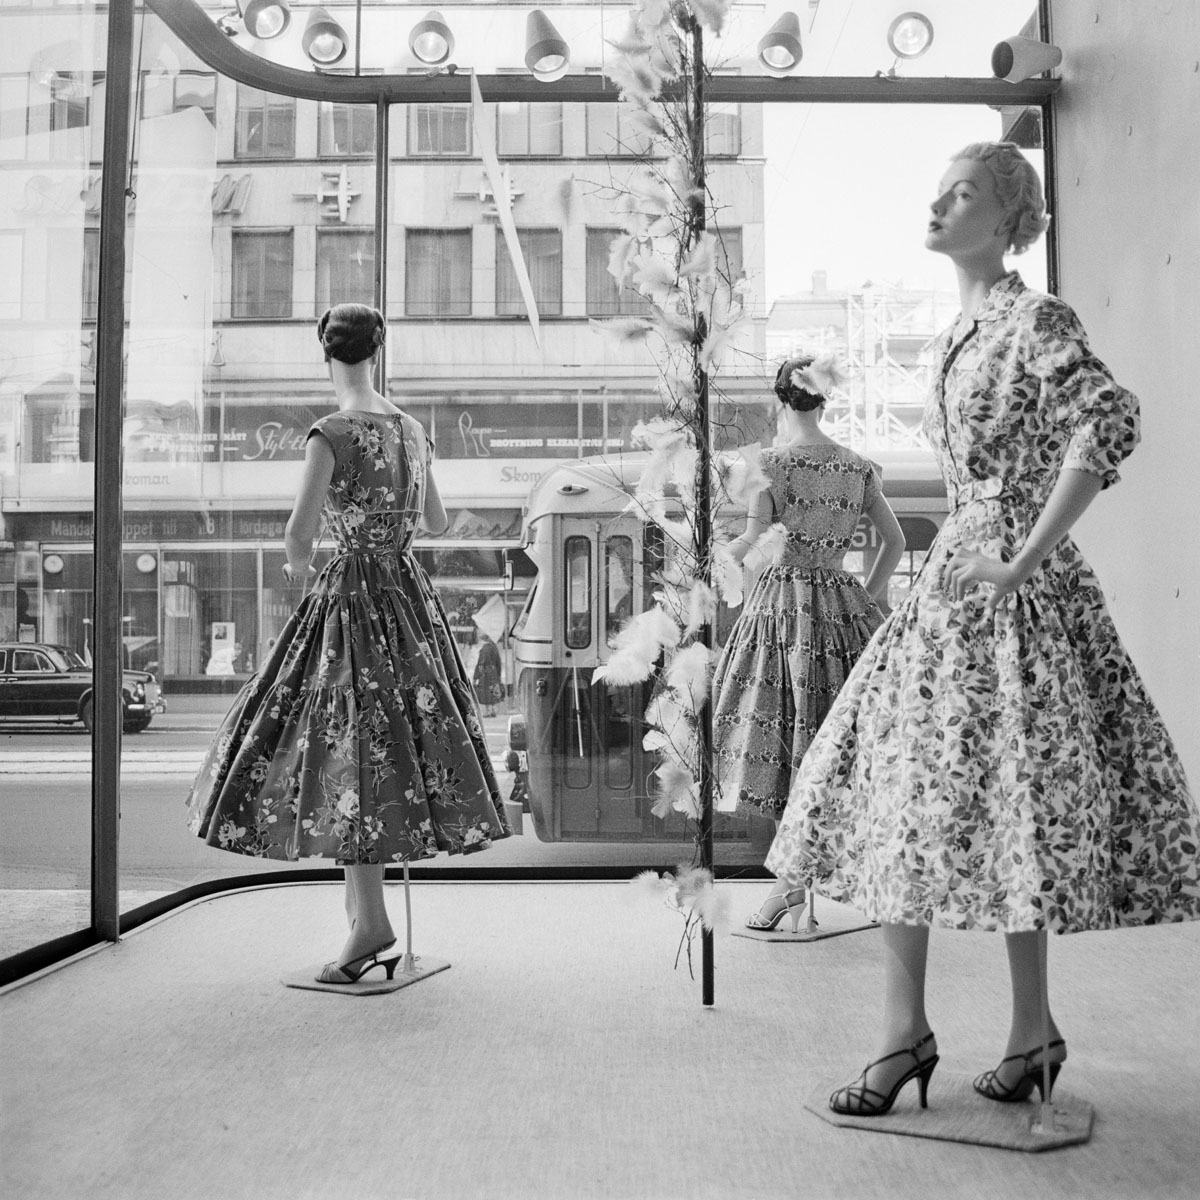 Storefront at Norrmalmstorg in Stockholm 1957